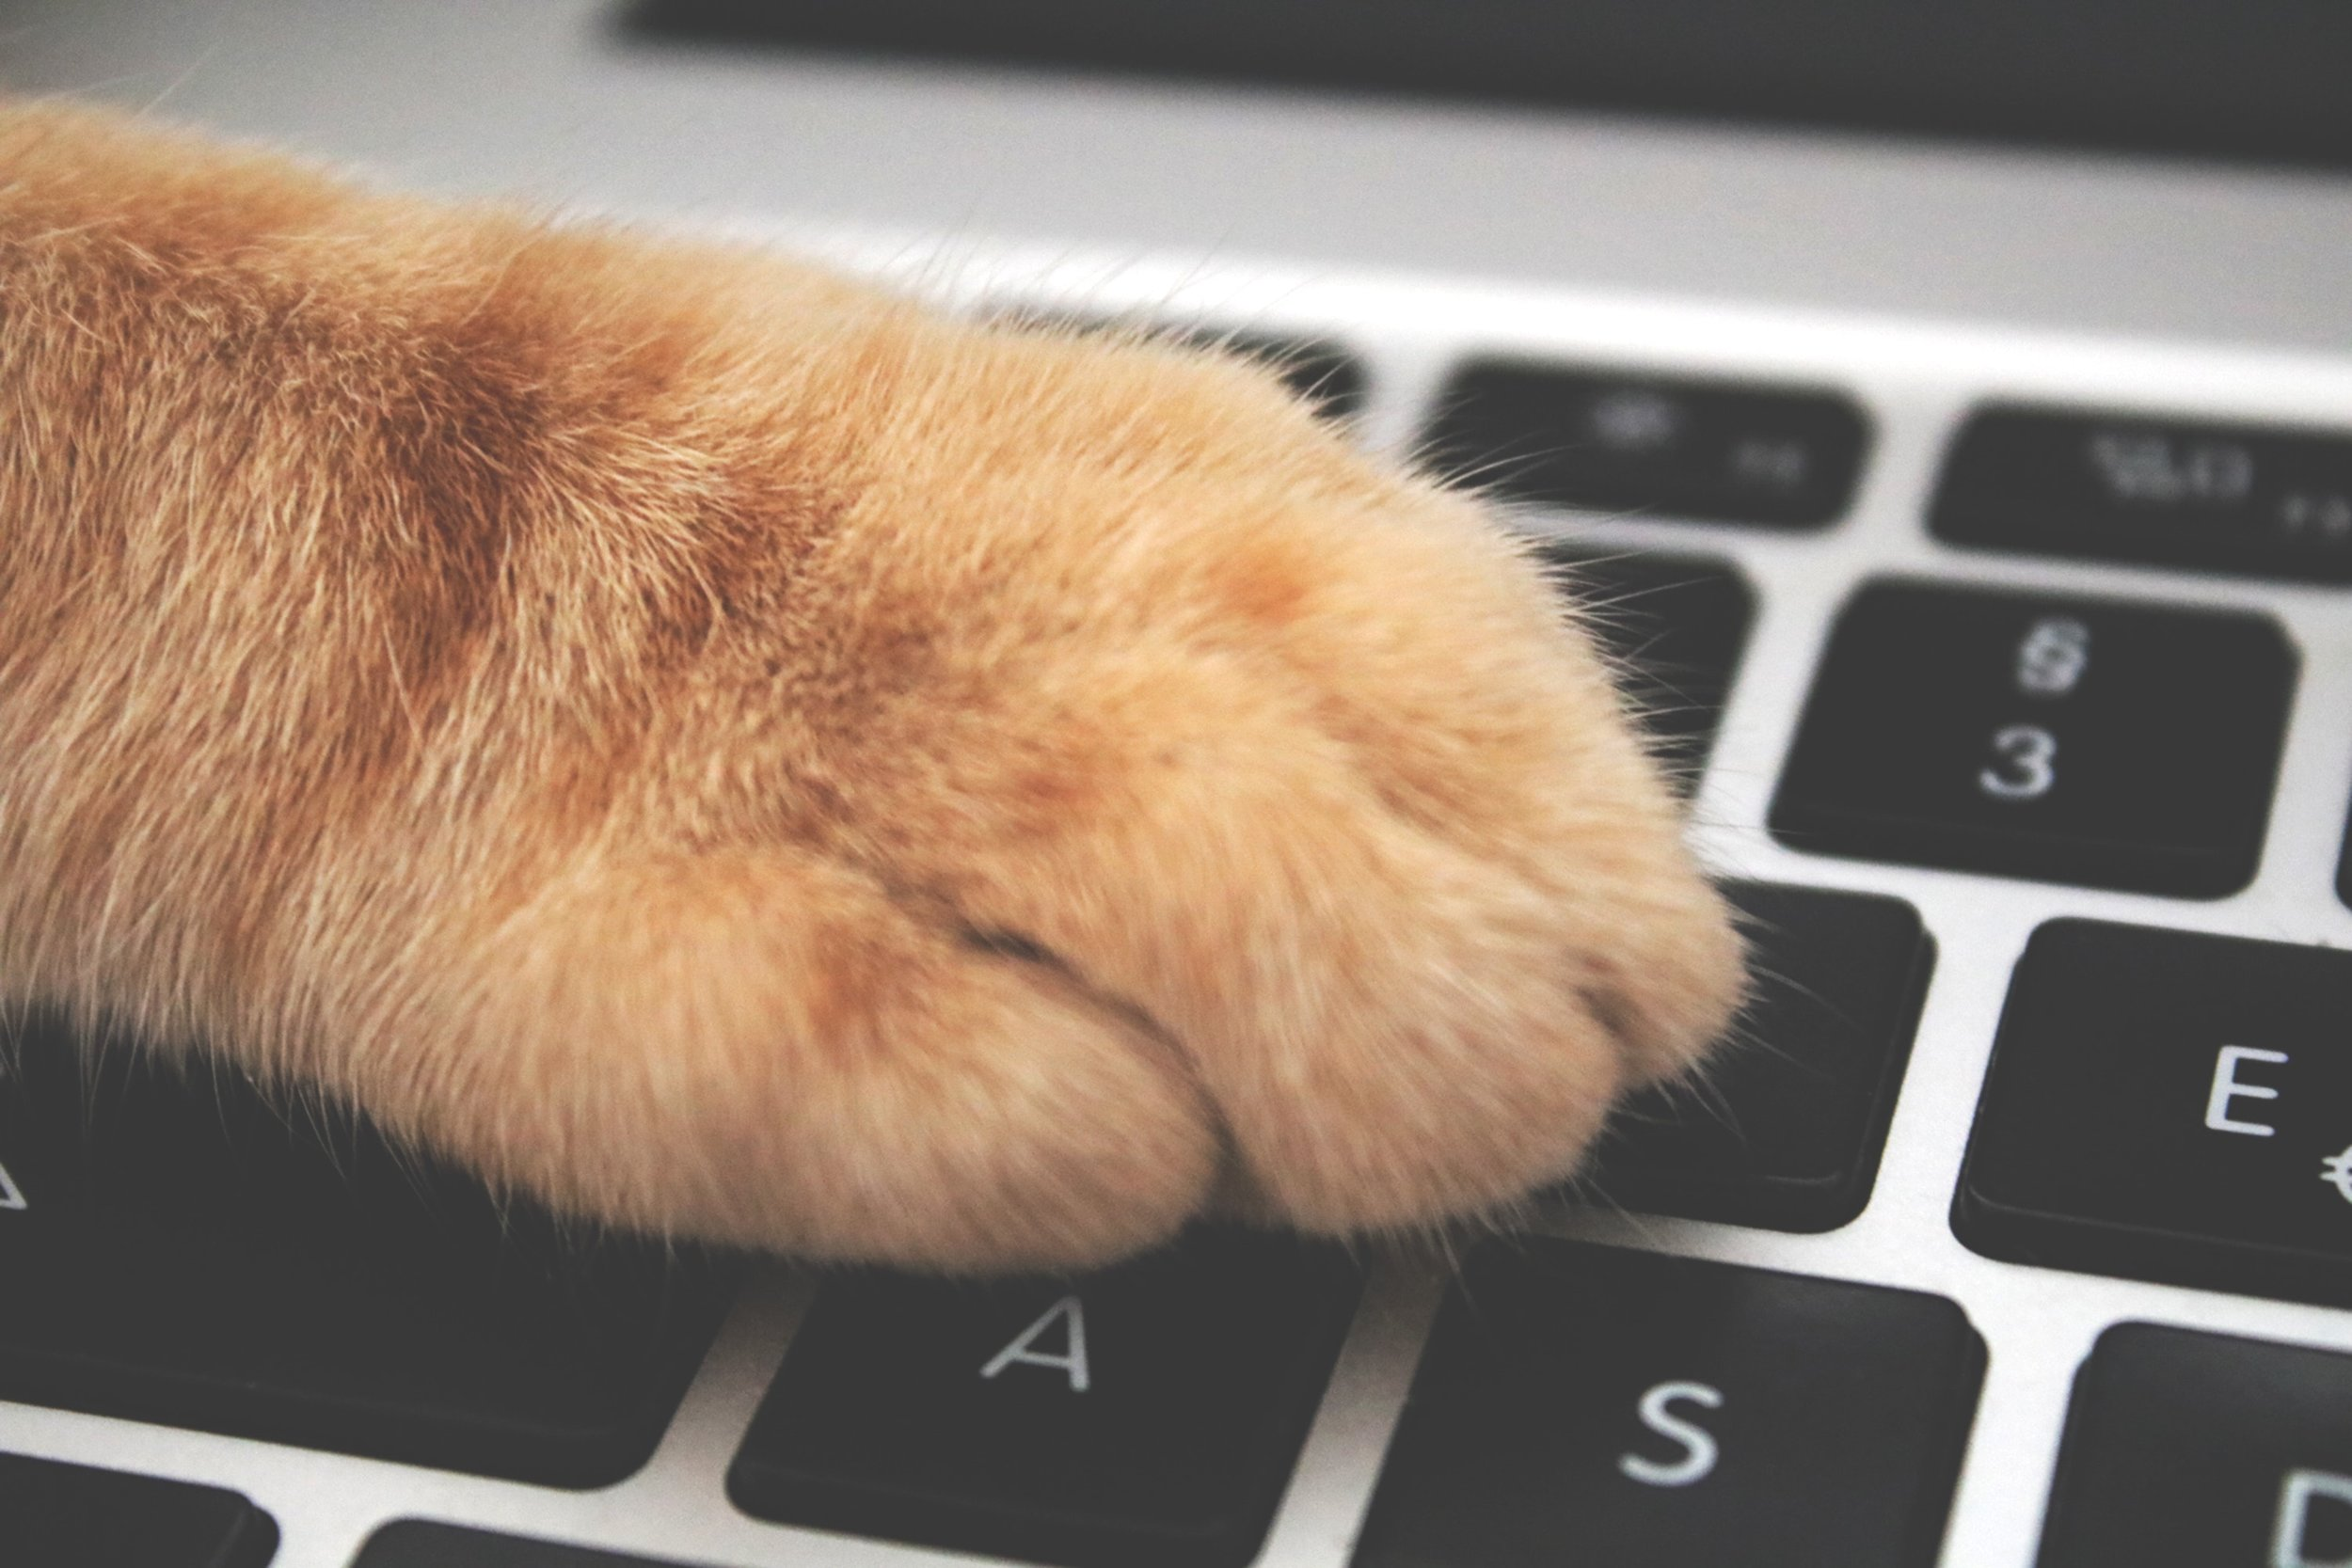 adorable-animal-cat-1440387.jpg